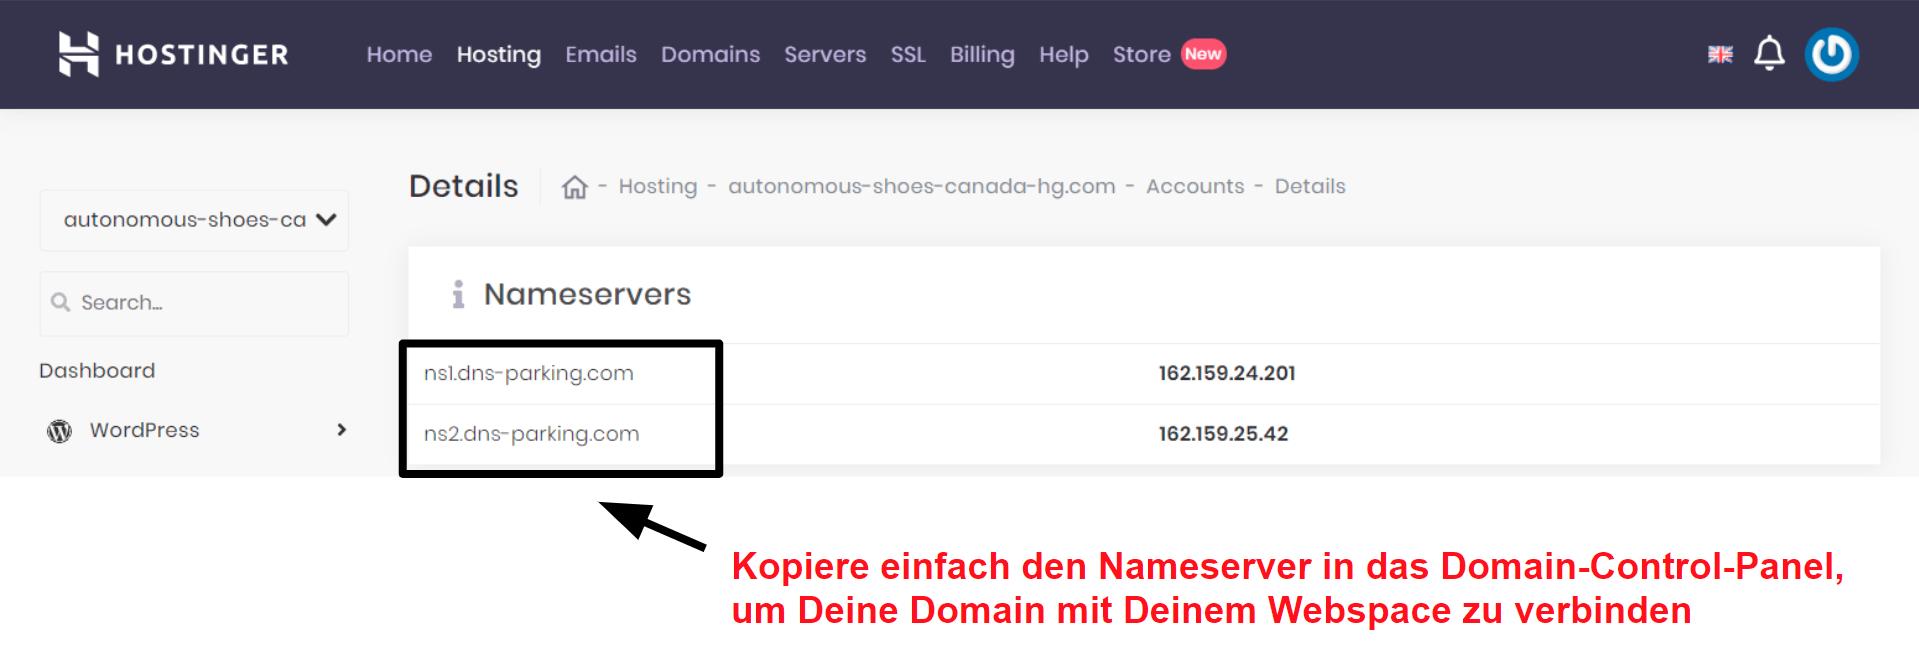 Hostinger domain connection information_DE